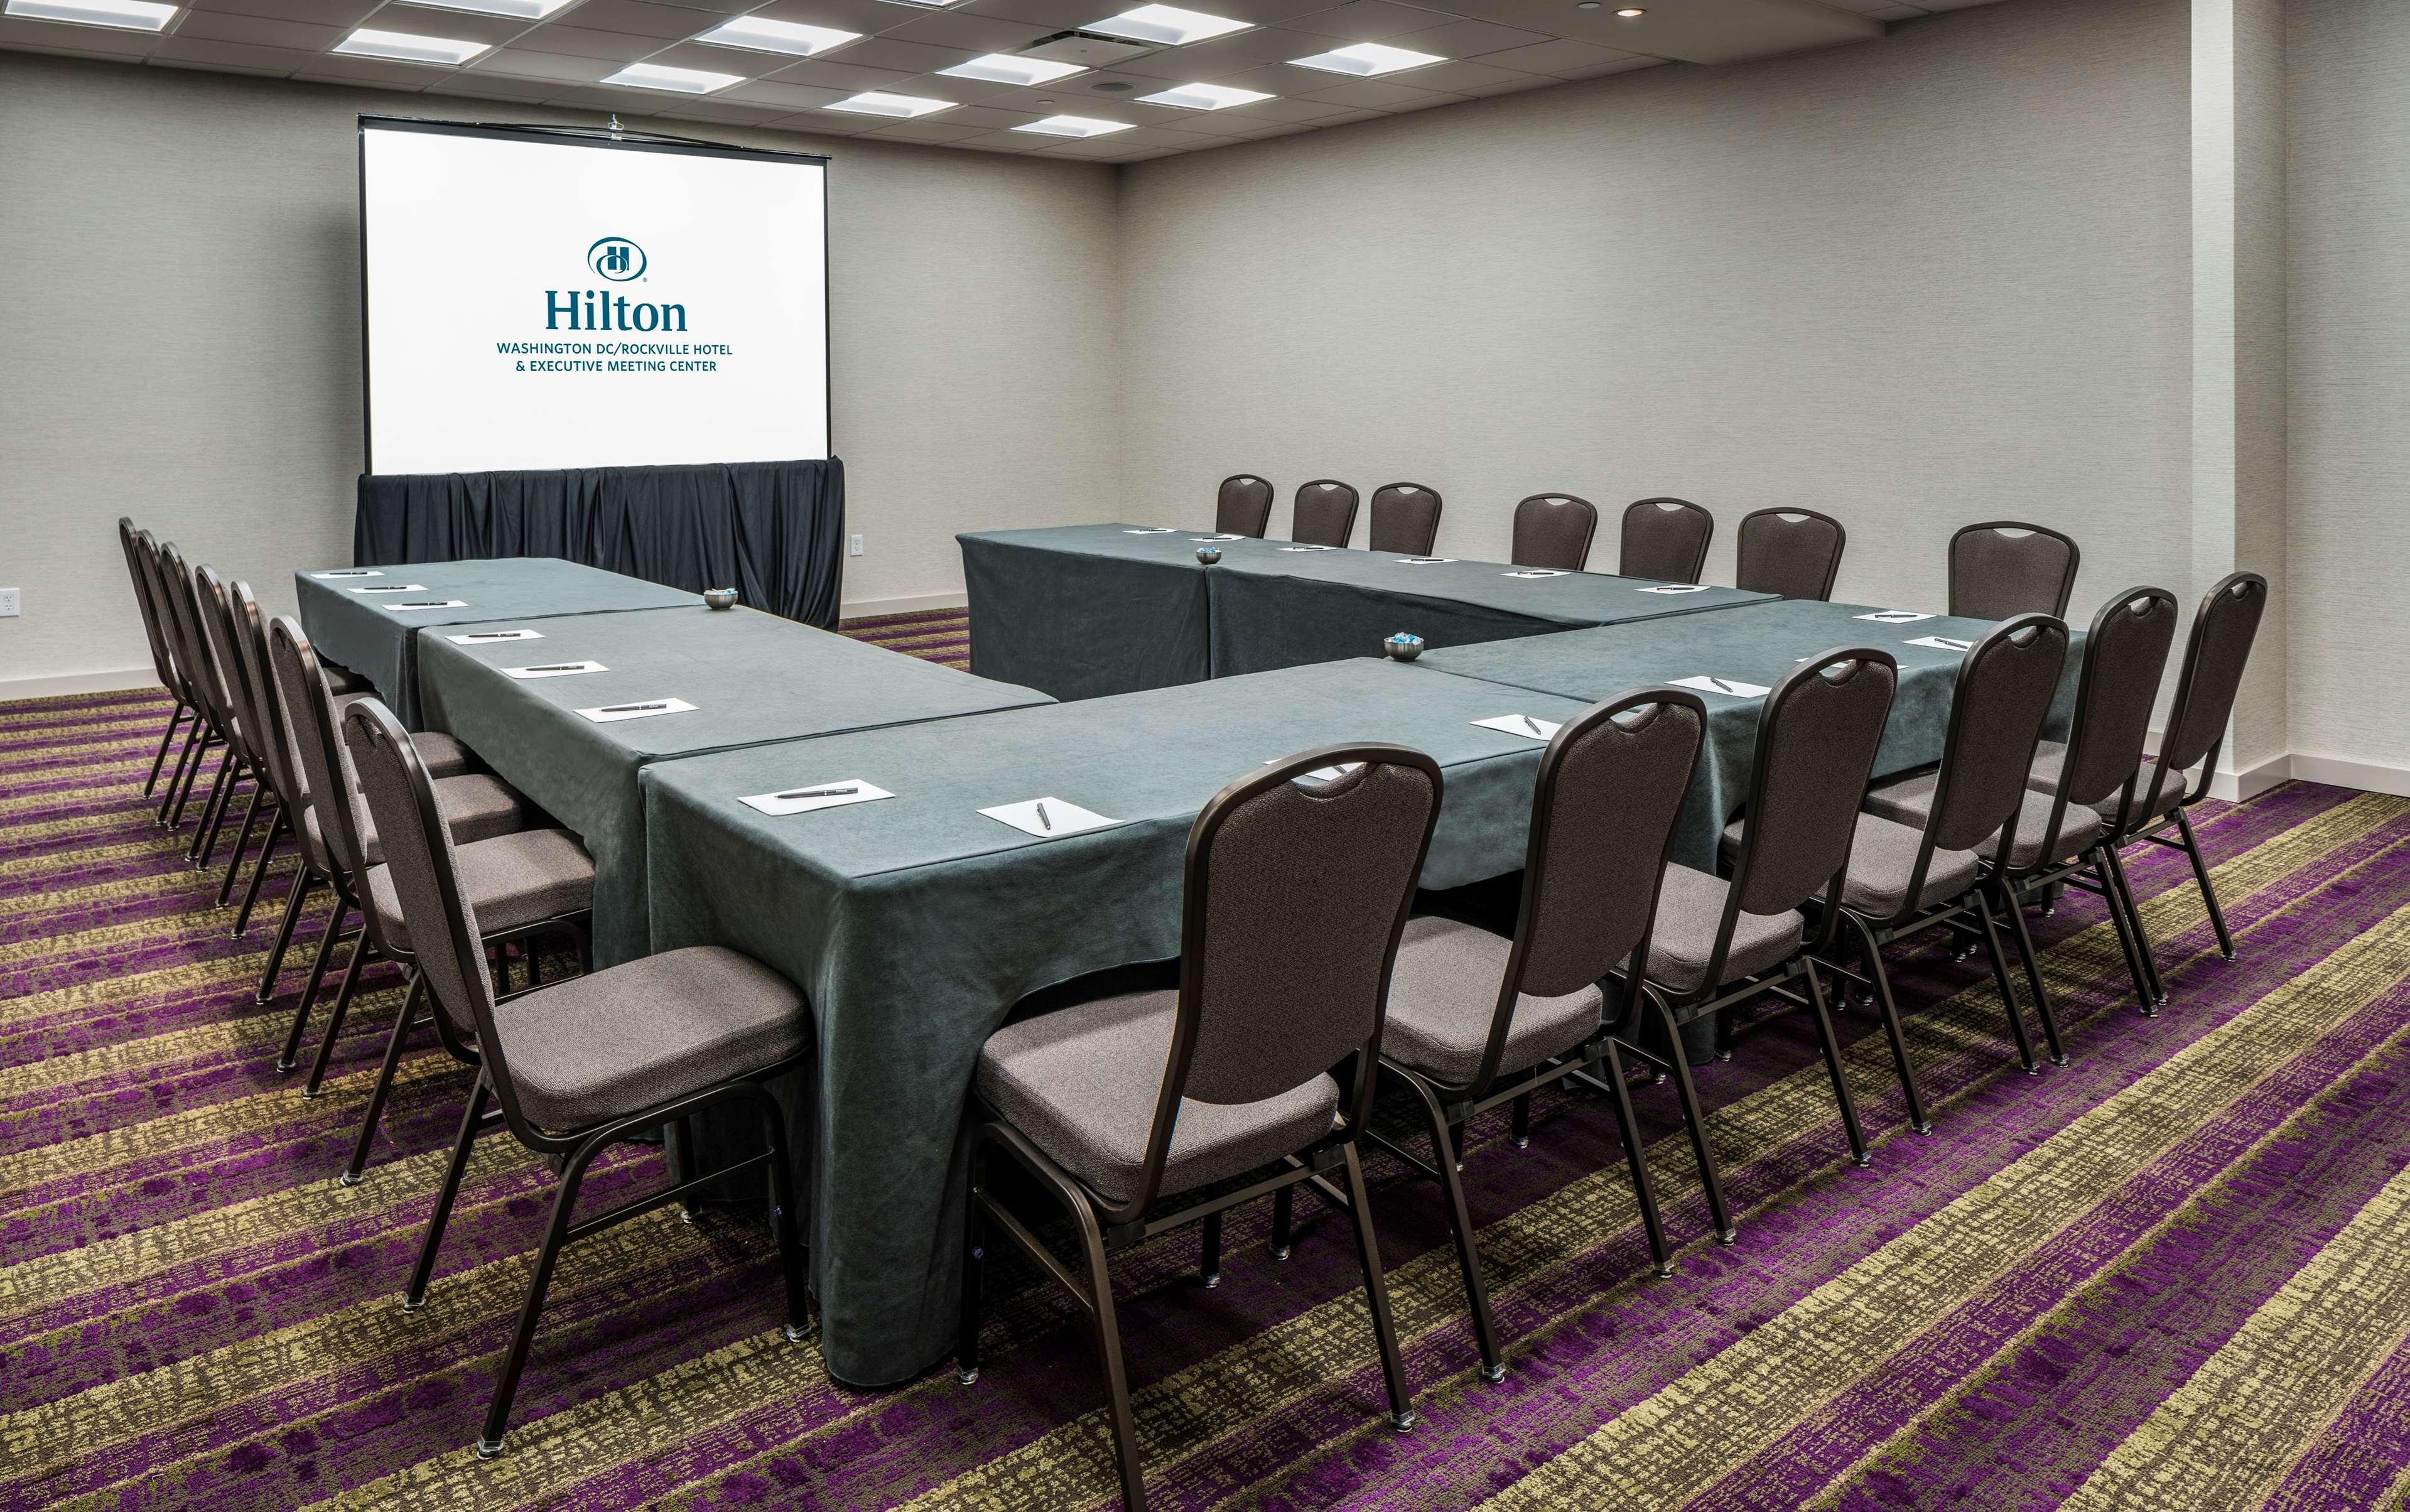 Hilton Washington DC/Rockville Hotel & Executive Meeting Ctr image 48